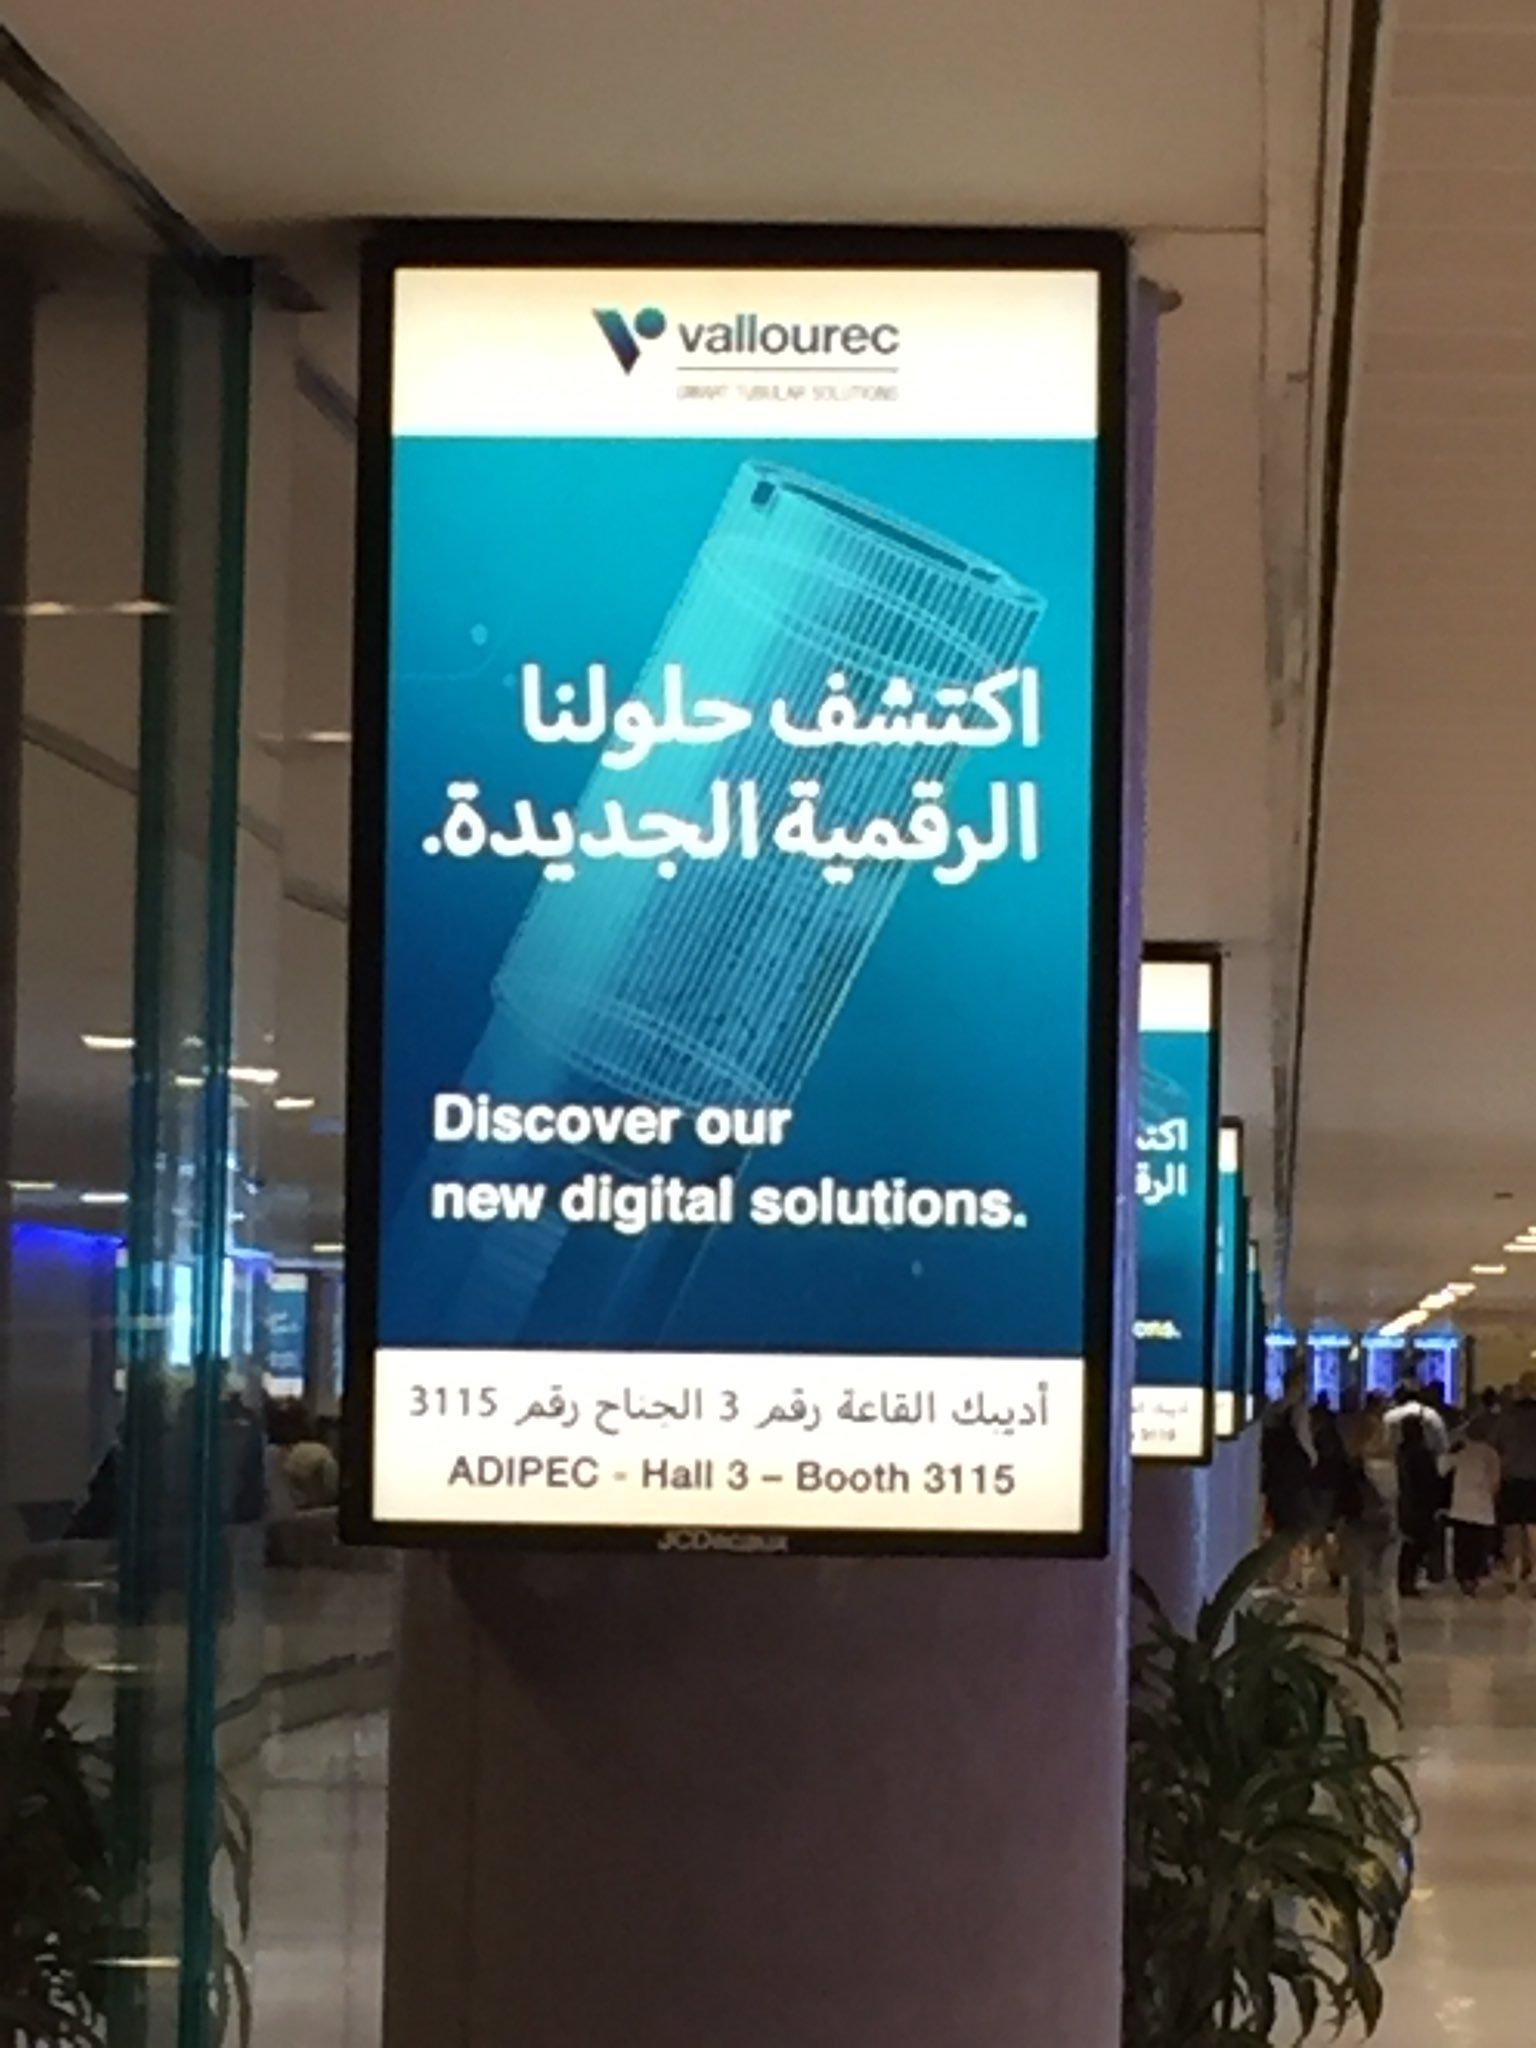 ADIPEC visible at the airport!